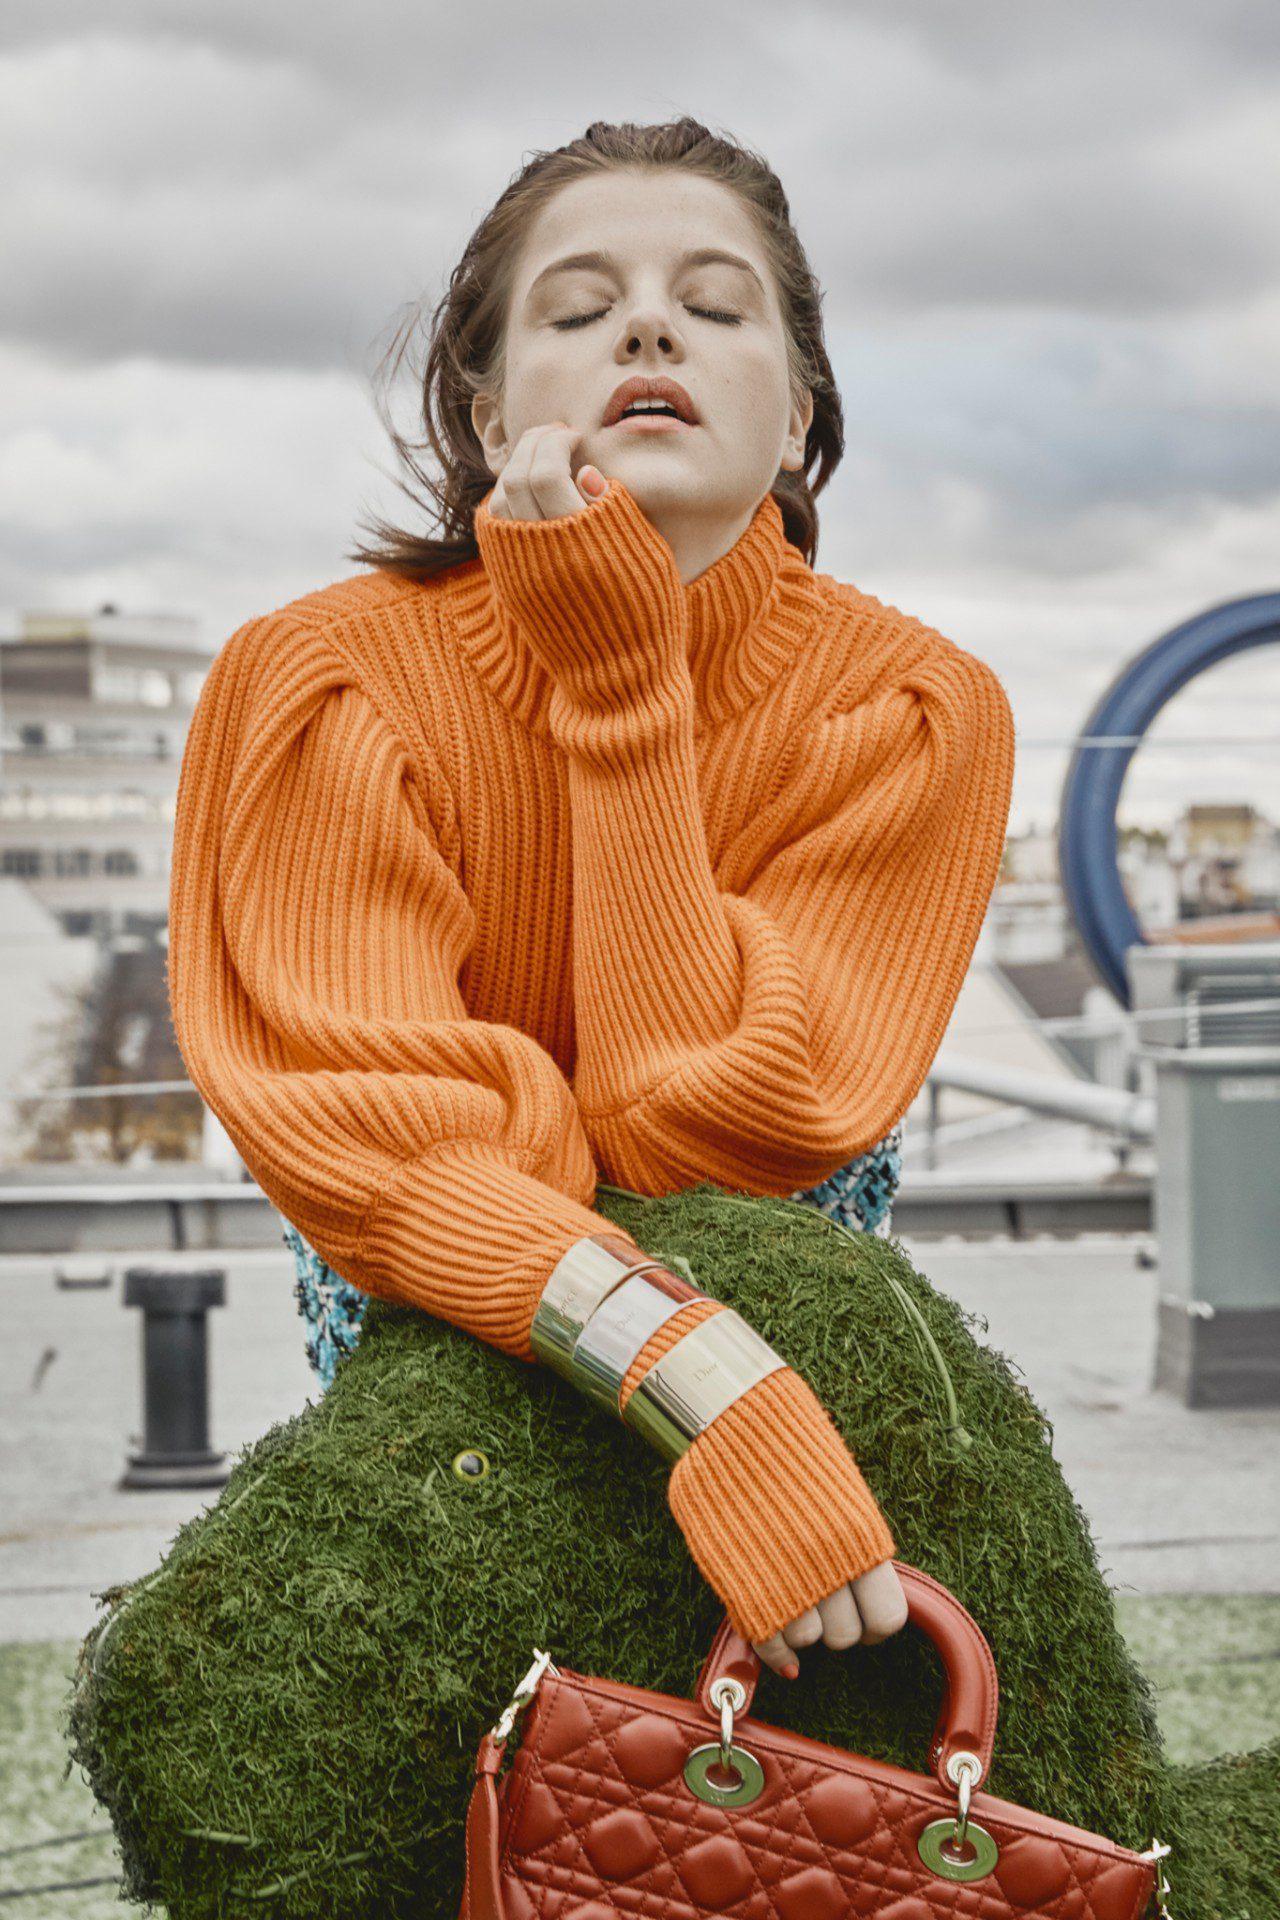 Robin Kater - Photographer jella haase x bunte